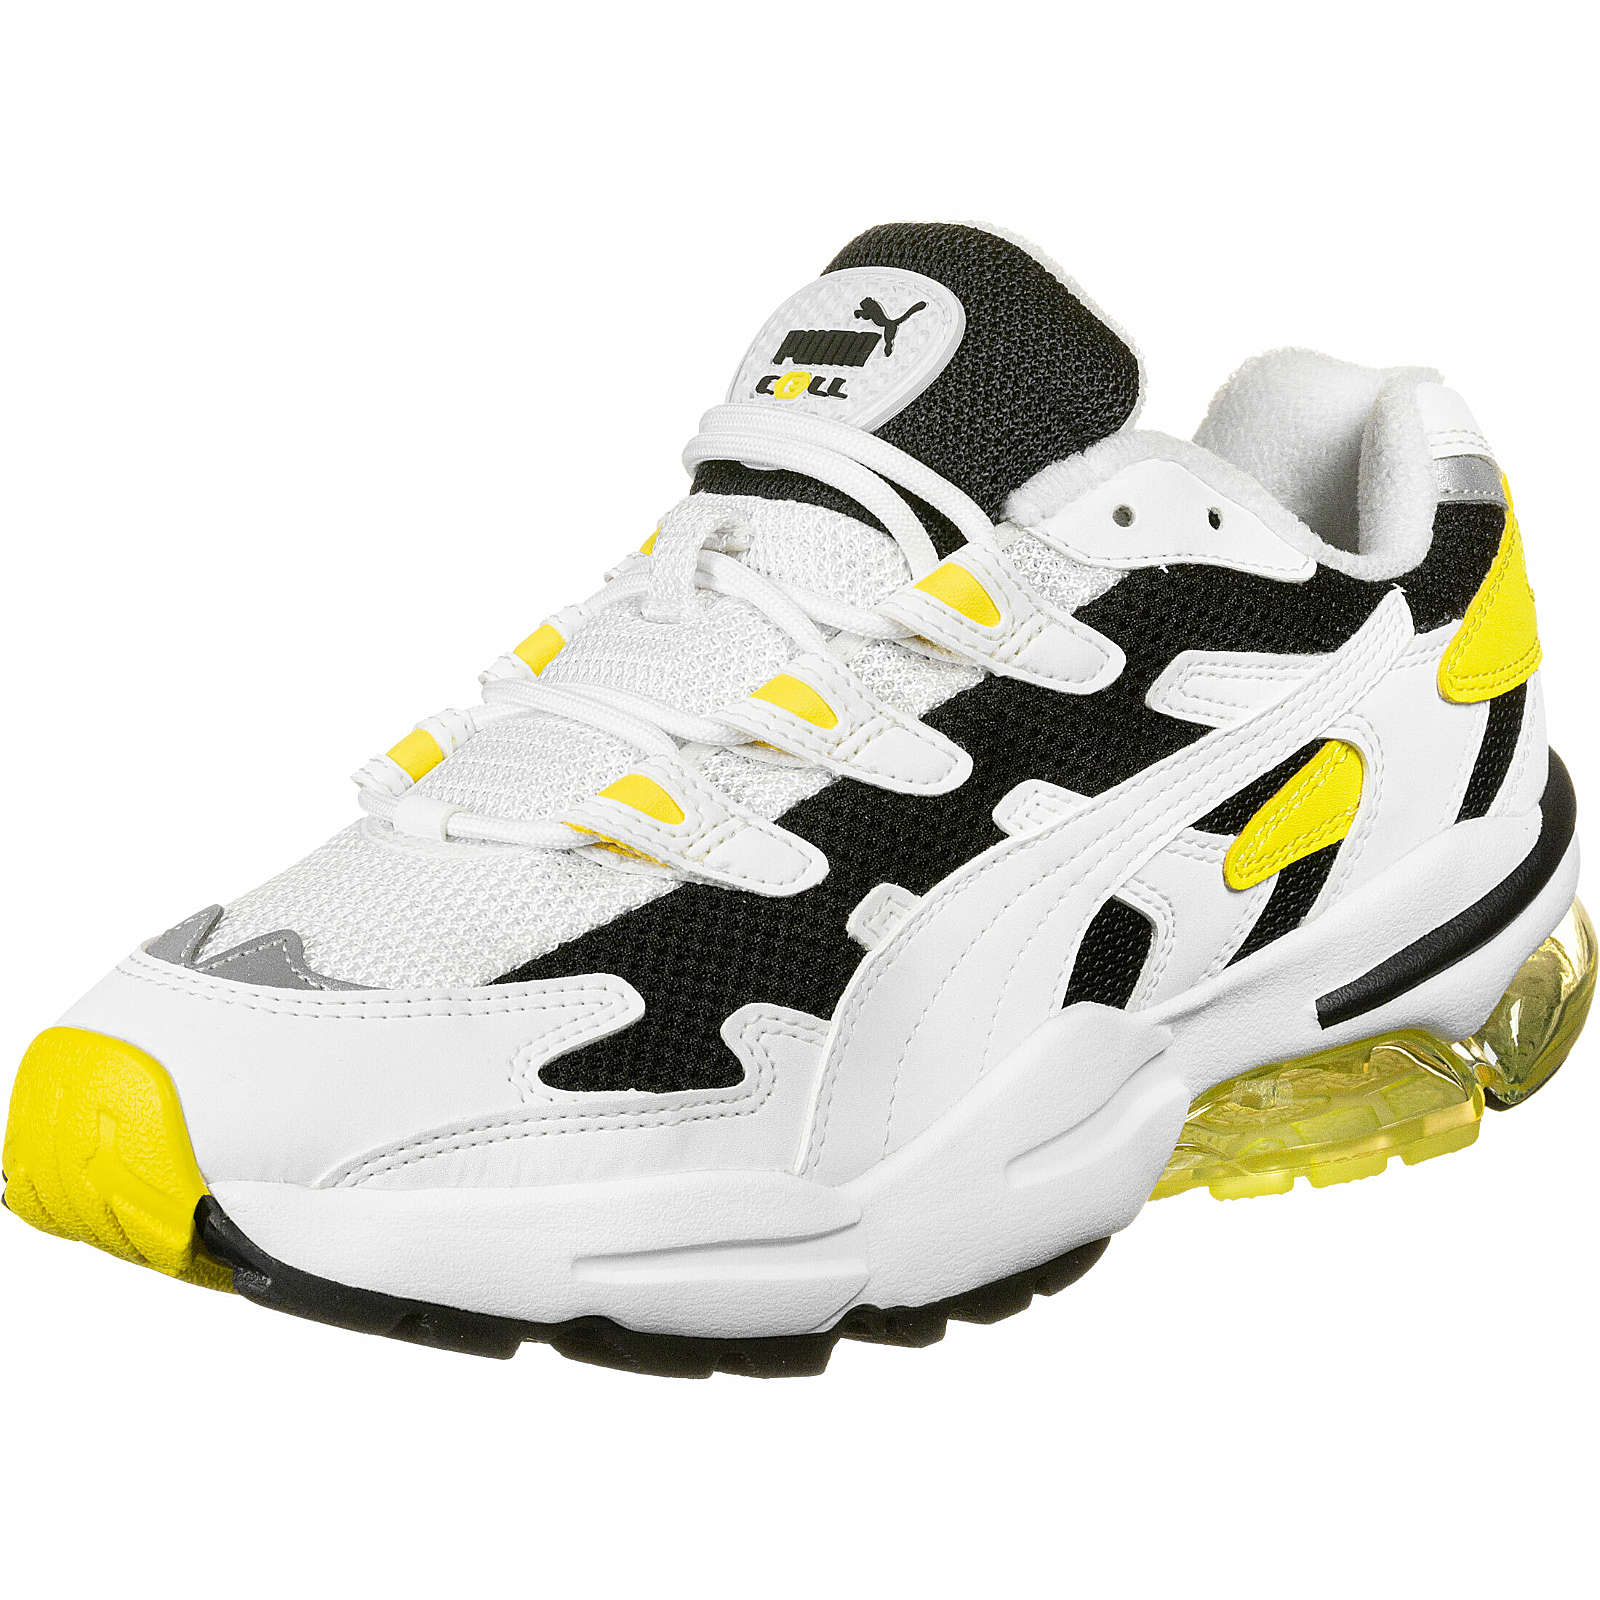 Puma Schuhe Cell Alien OG Sneakers Low schwarz/weiß Herren Gr. 43